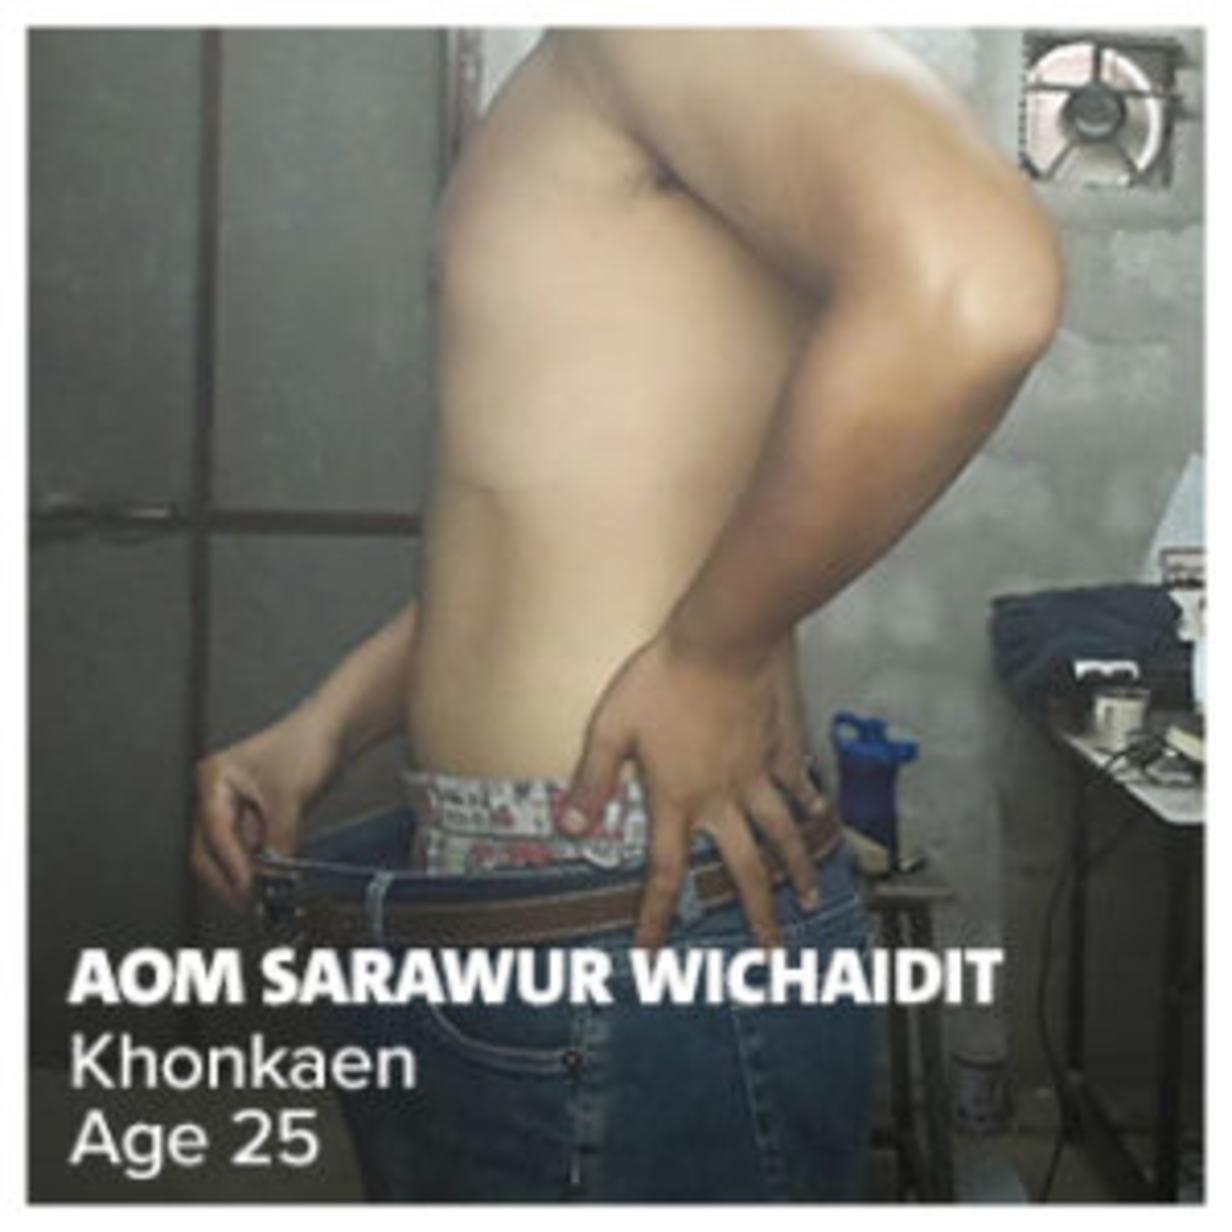 aom-sarawur-wichaidit_grid